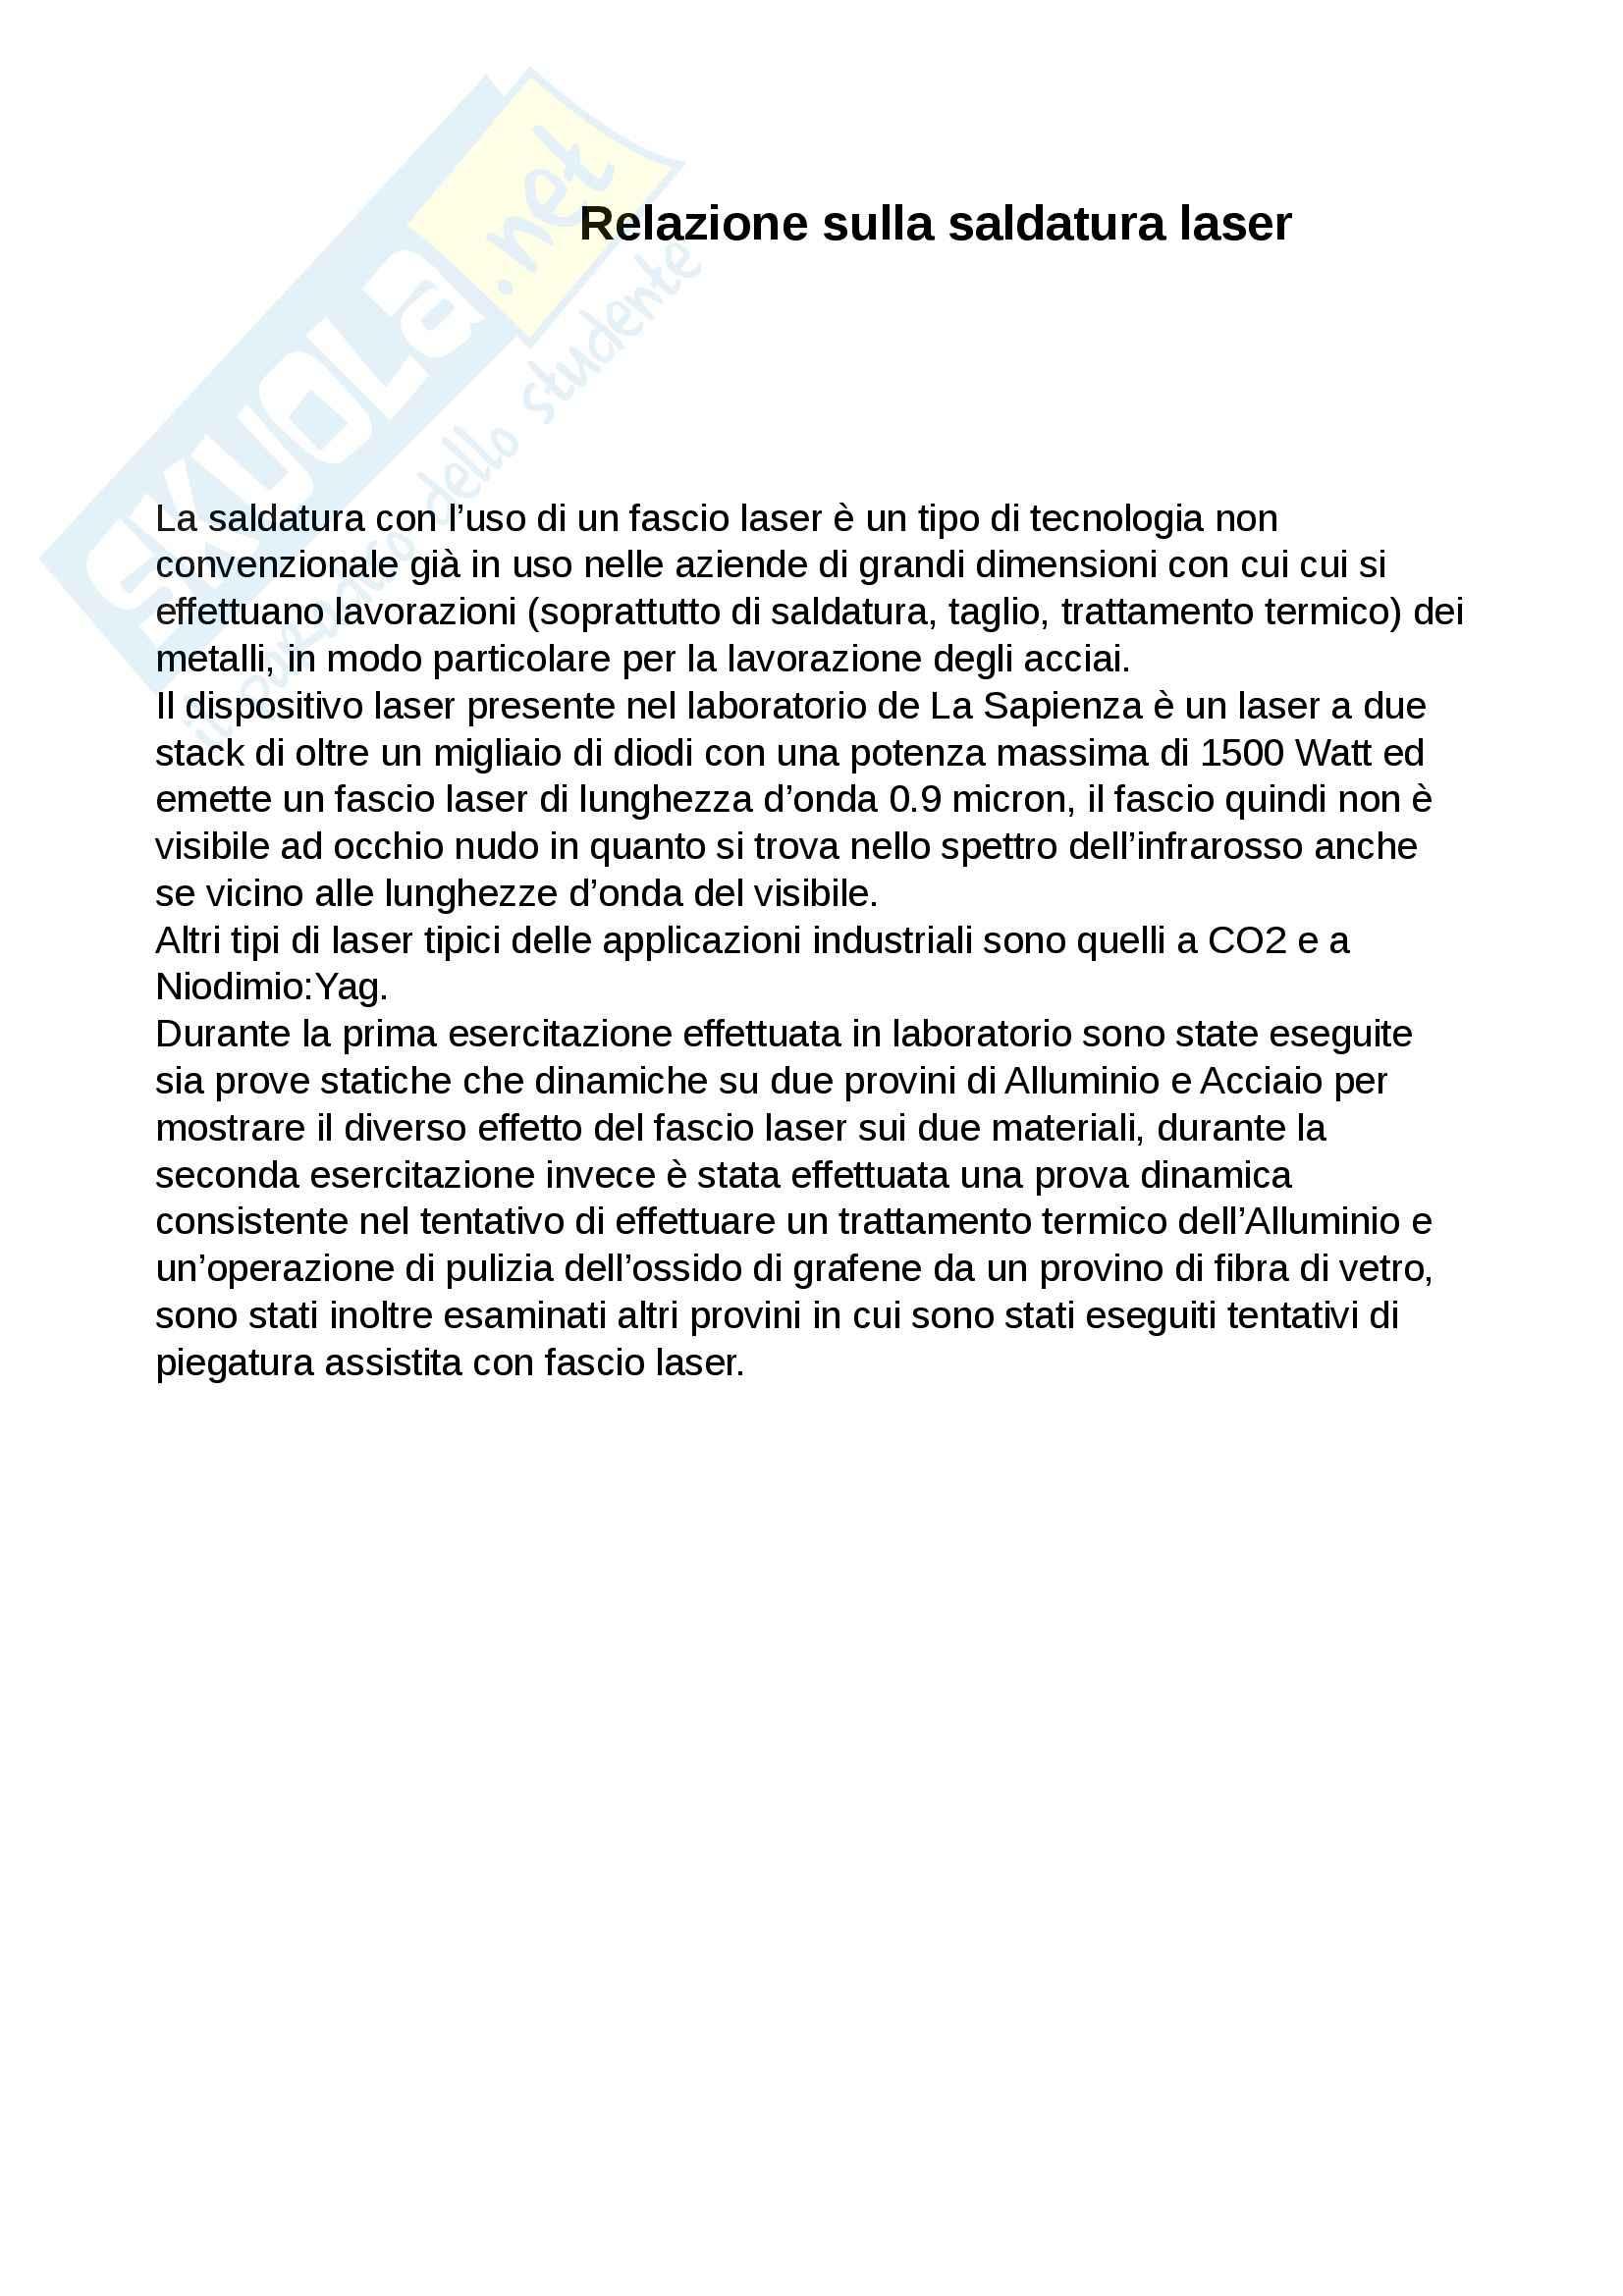 Relazione saldatura laser, Tecnologie speciali